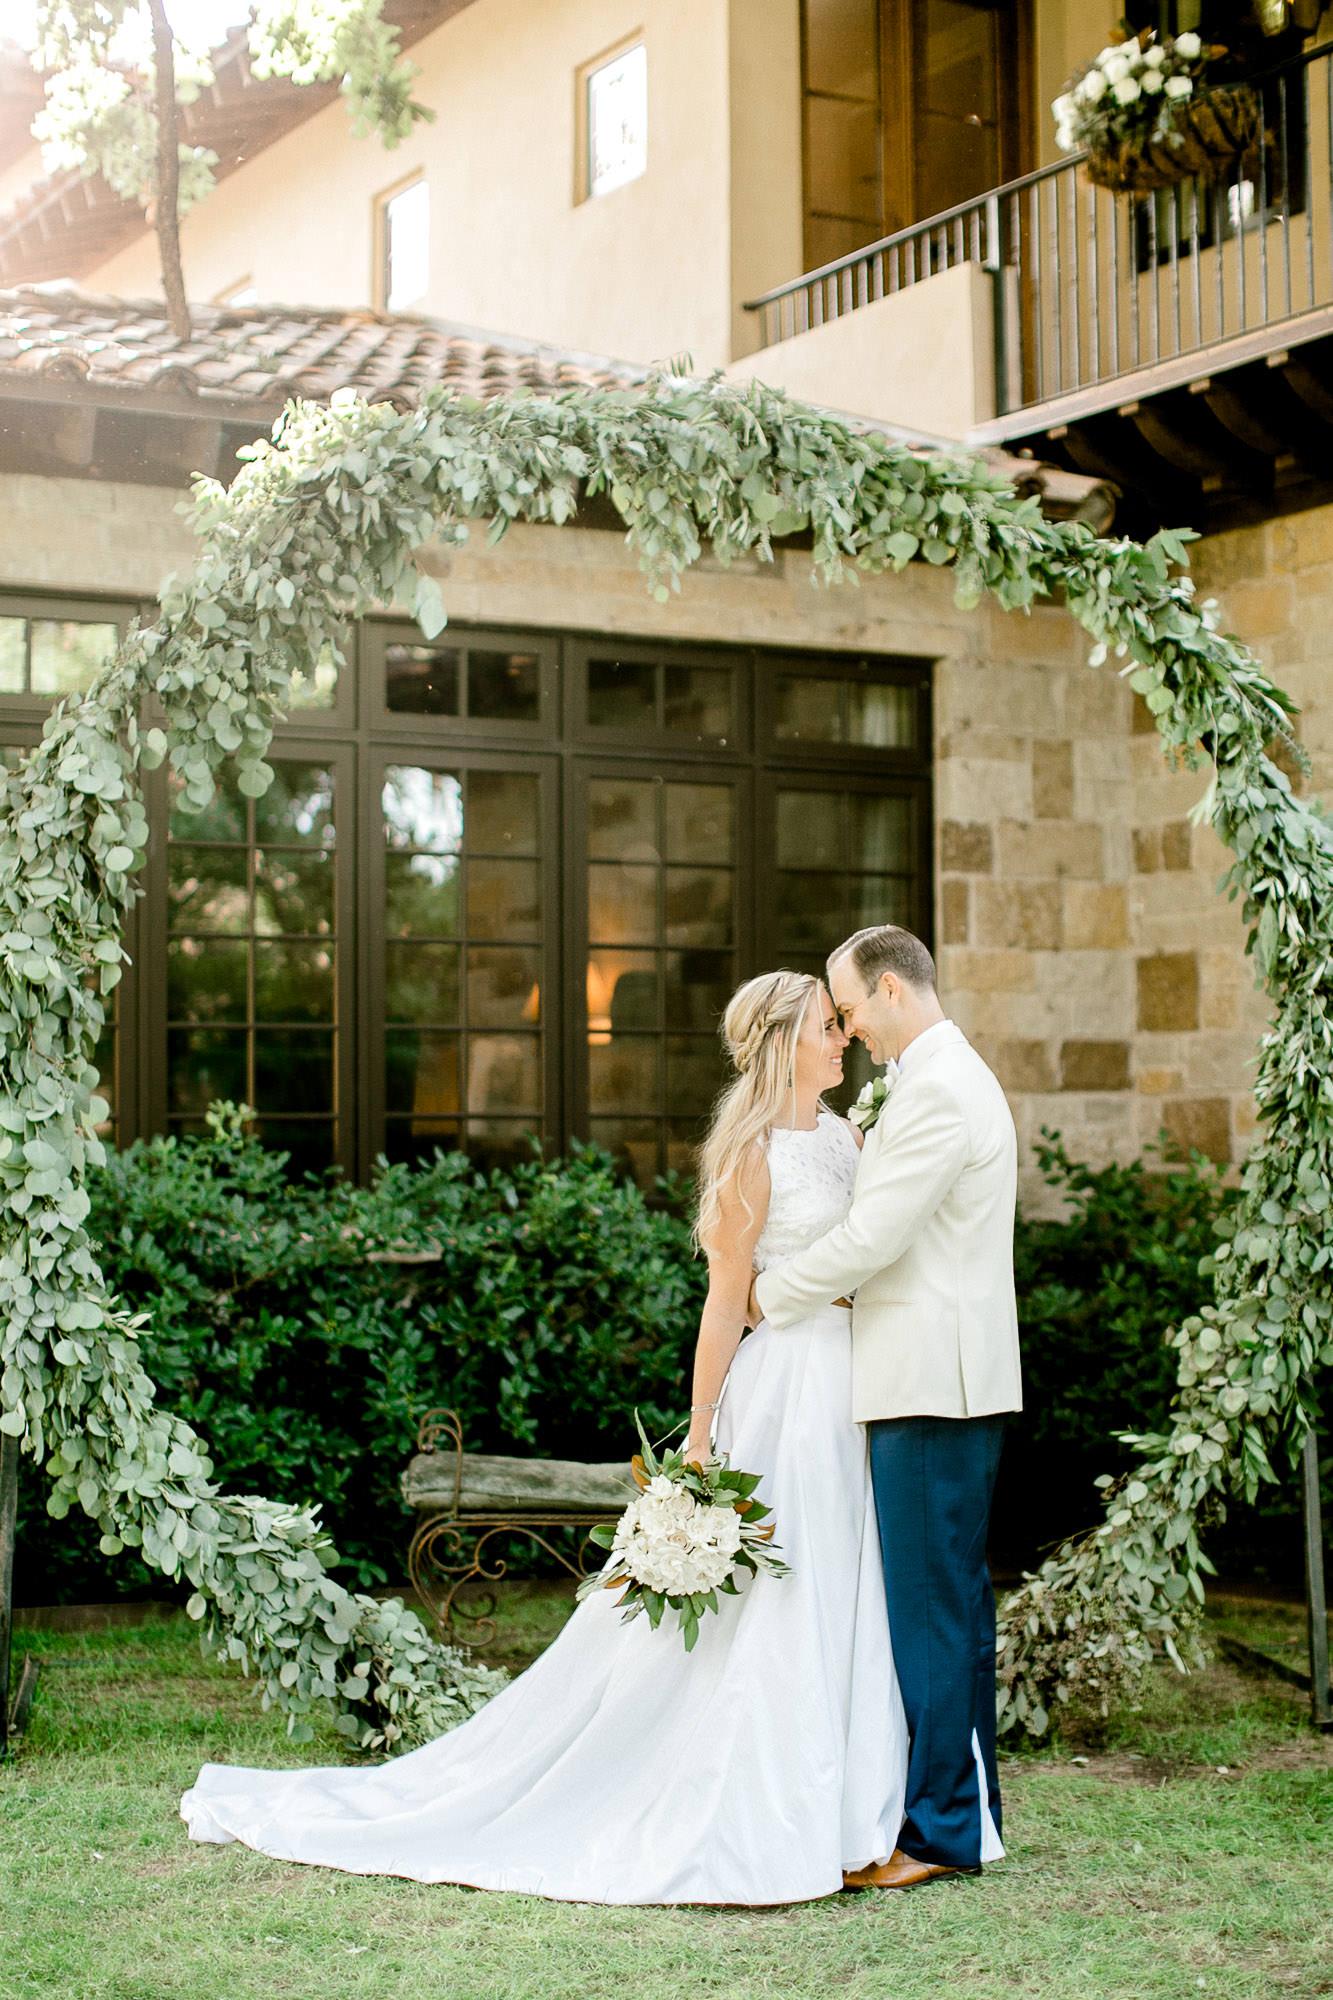 ali-brandon-hamilton-lubbock-wedding-photographer-estate-lee-lewis-construction-bee-alleej_0098.jpg